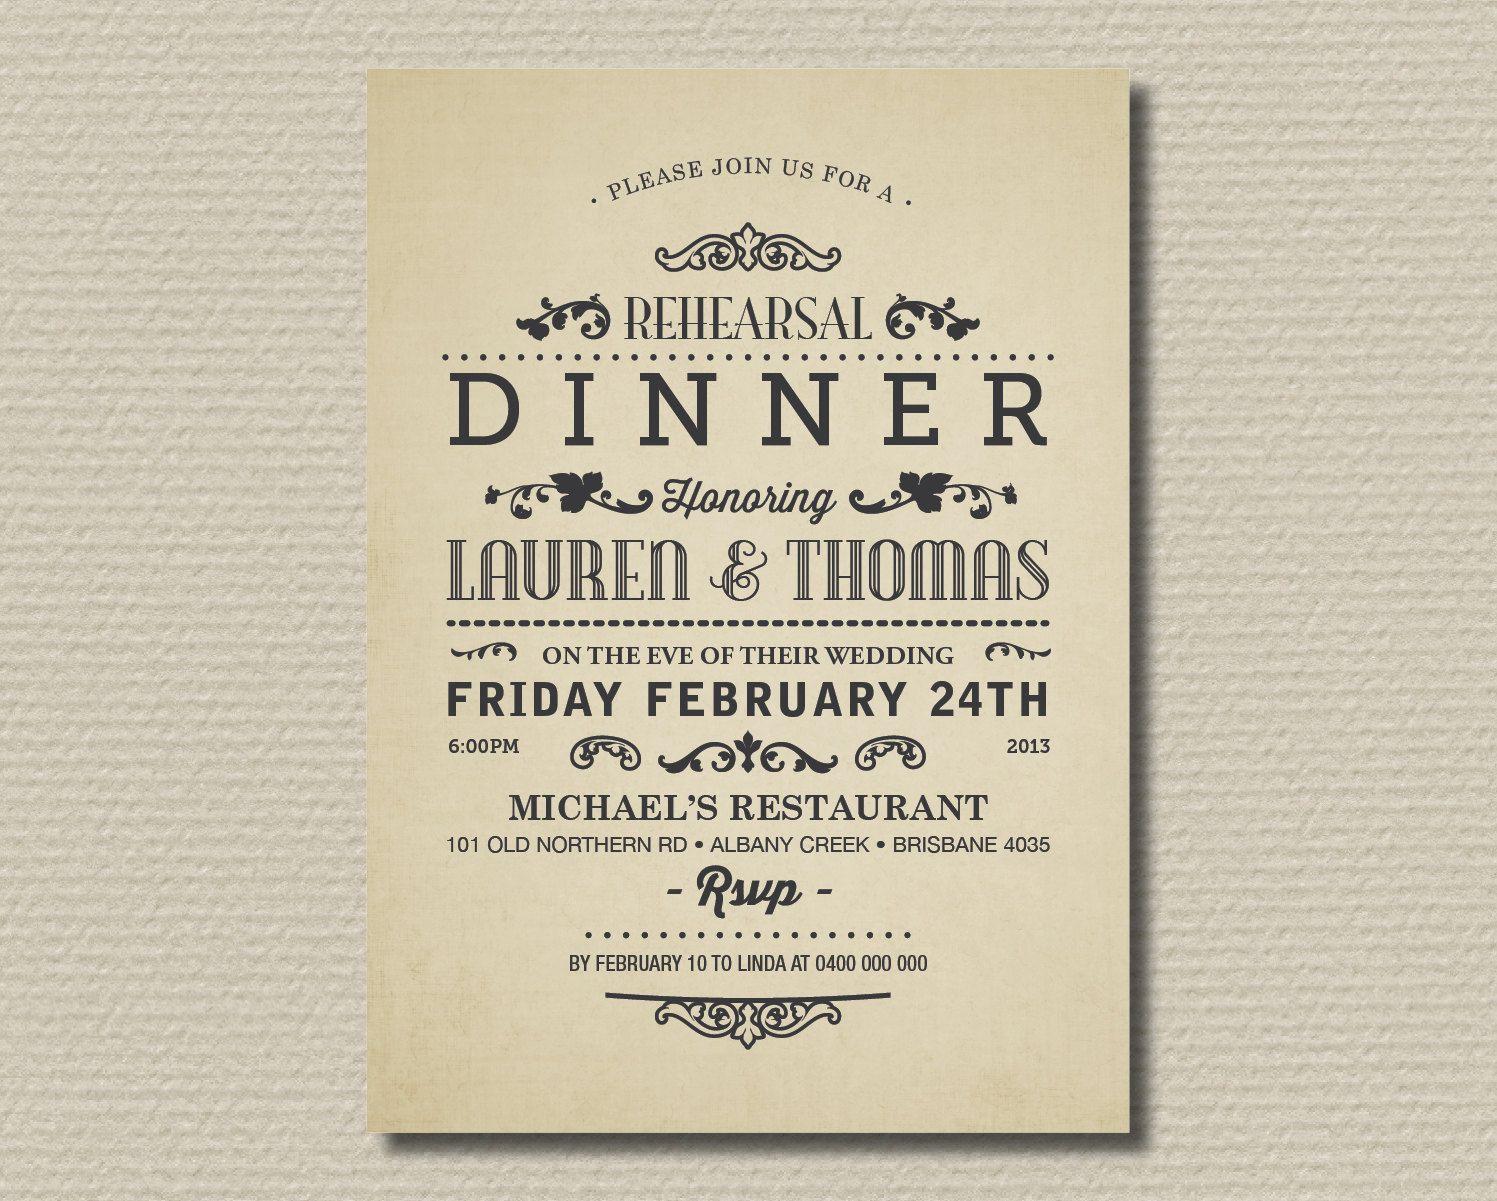 Birthday Dinner Invitation Wording Ideas For James